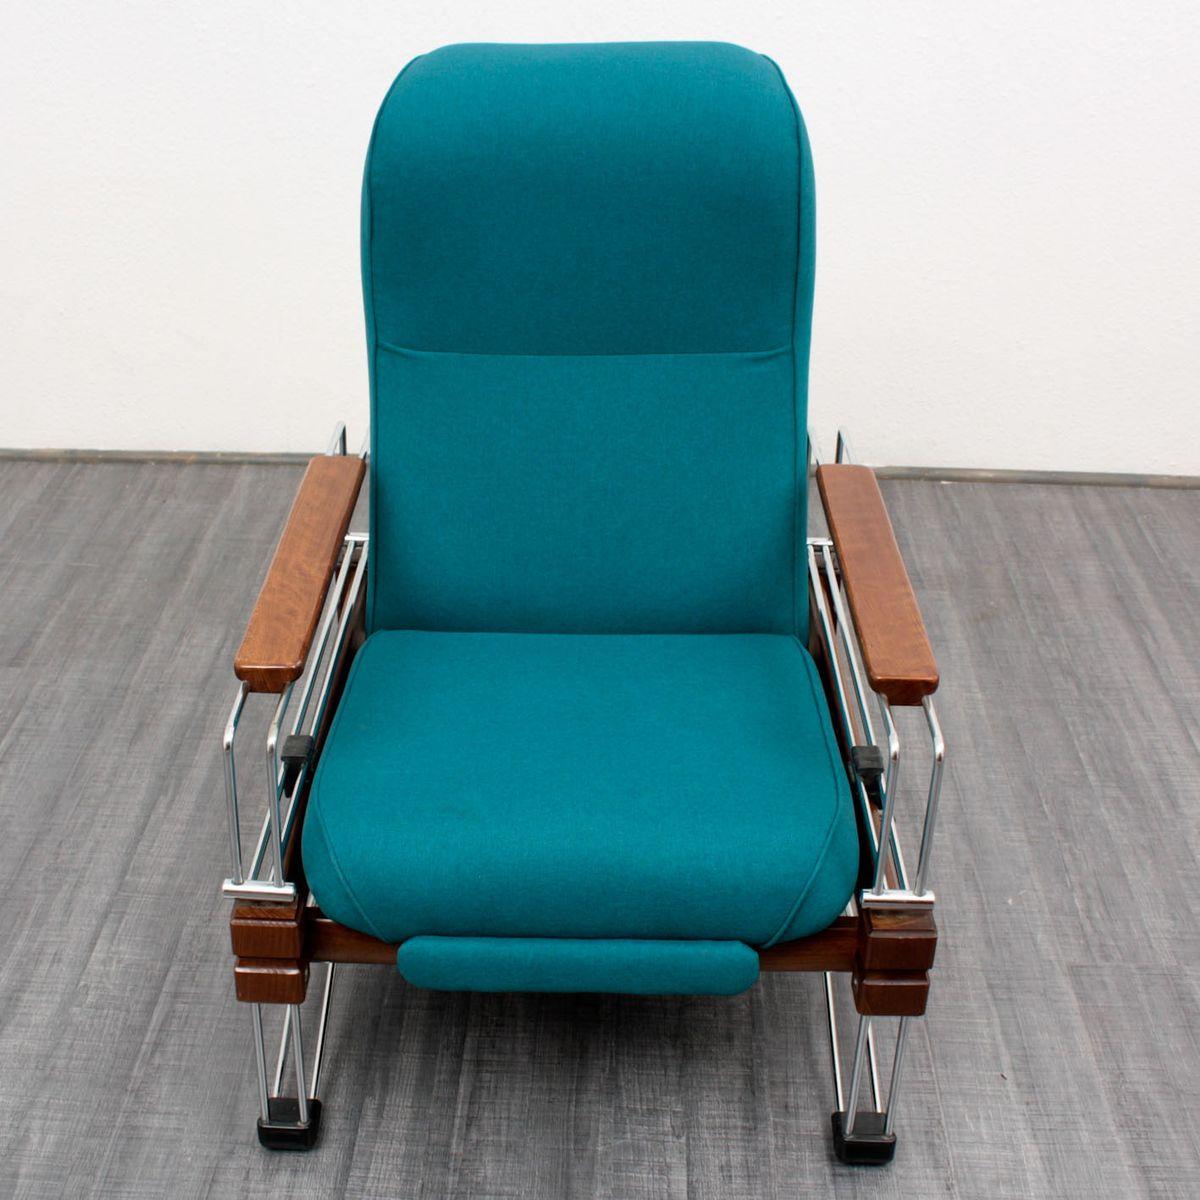 Vintage Lounge Sessel aus Holz mit Verchromten Gestell bei Pamono kaufen